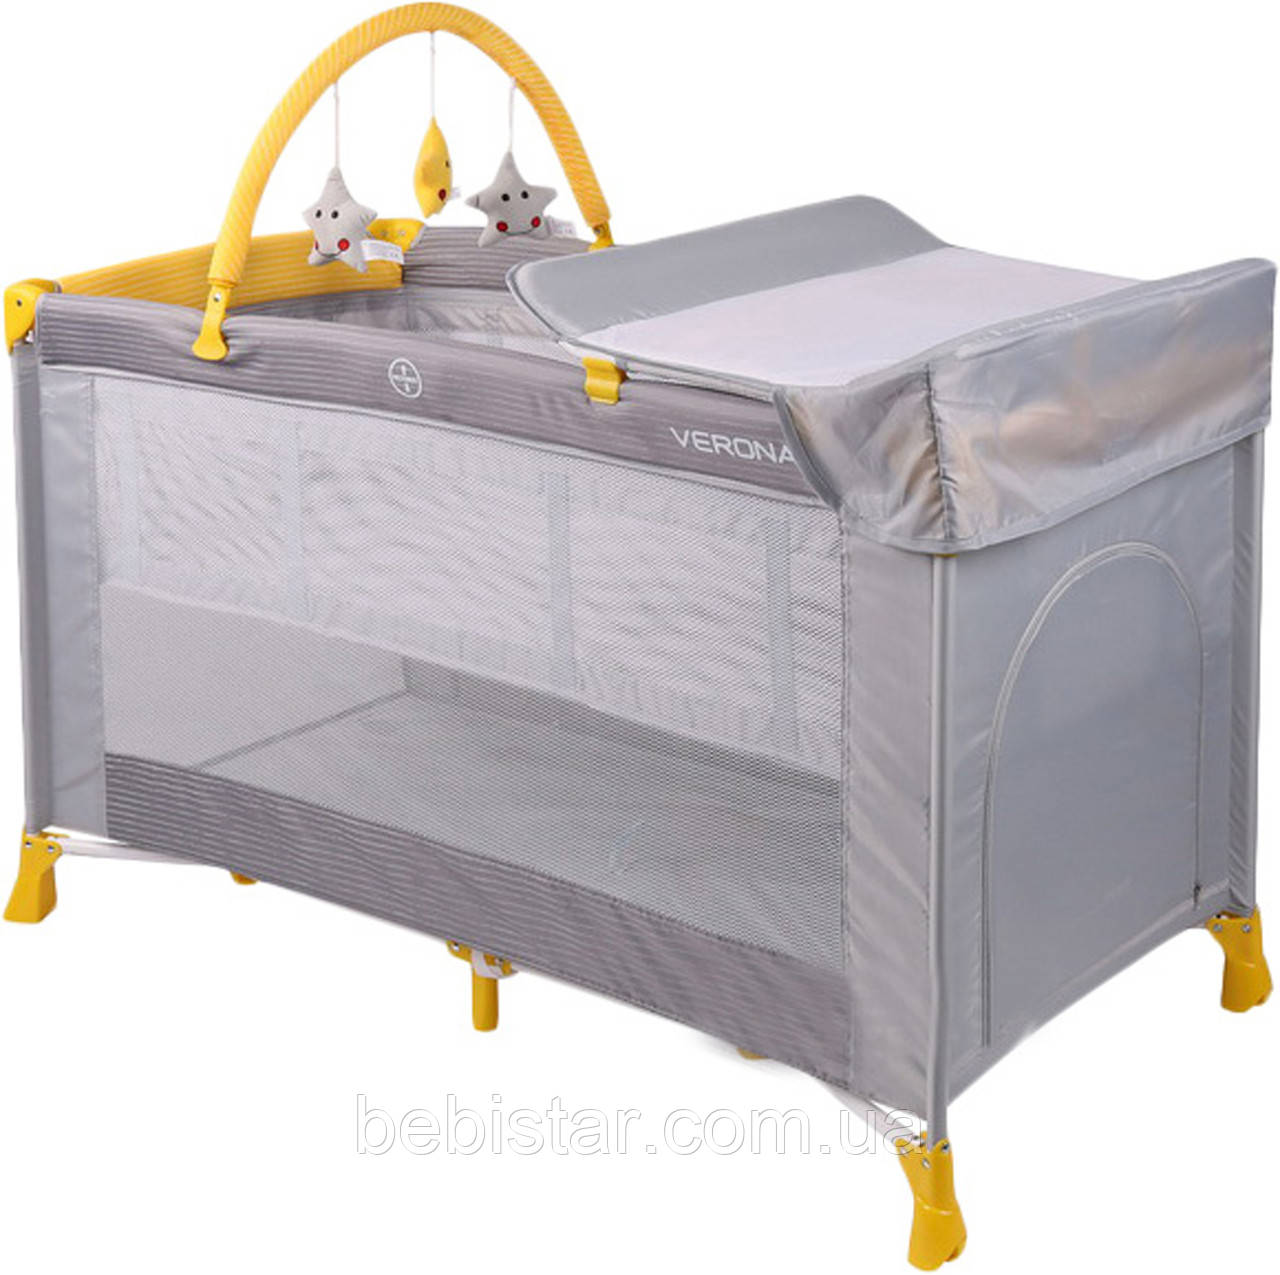 Кровать-манеж серо-желтый Lorelli VERONA 2 L GREY&YELLOW